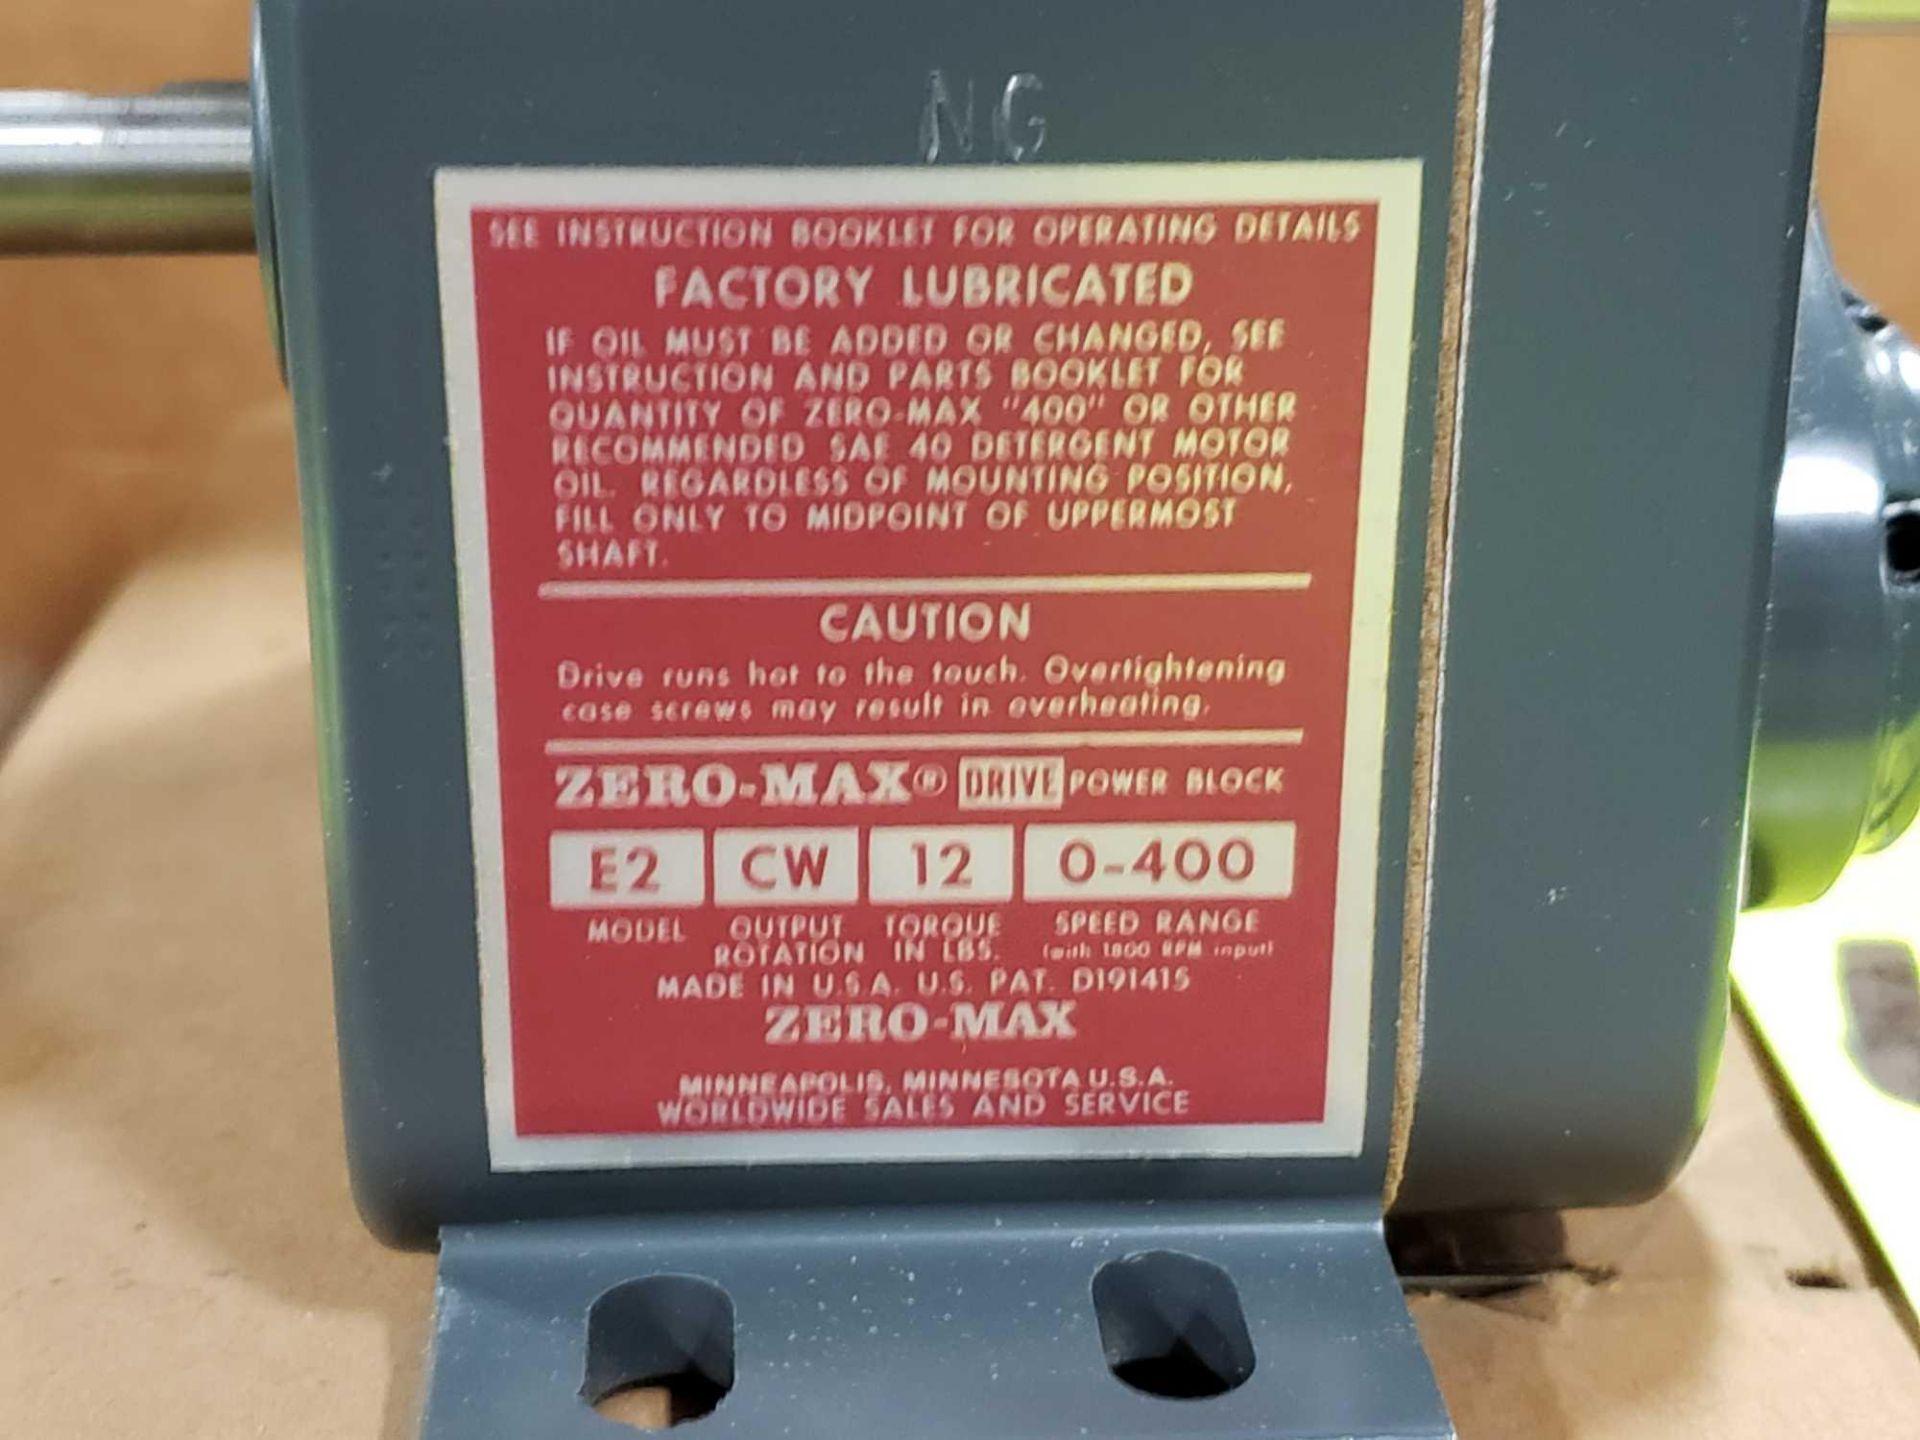 Lot 45 - Zero-max drive power block model E2, CW output rotation, 12lb torque, 0-400 speed range. New.